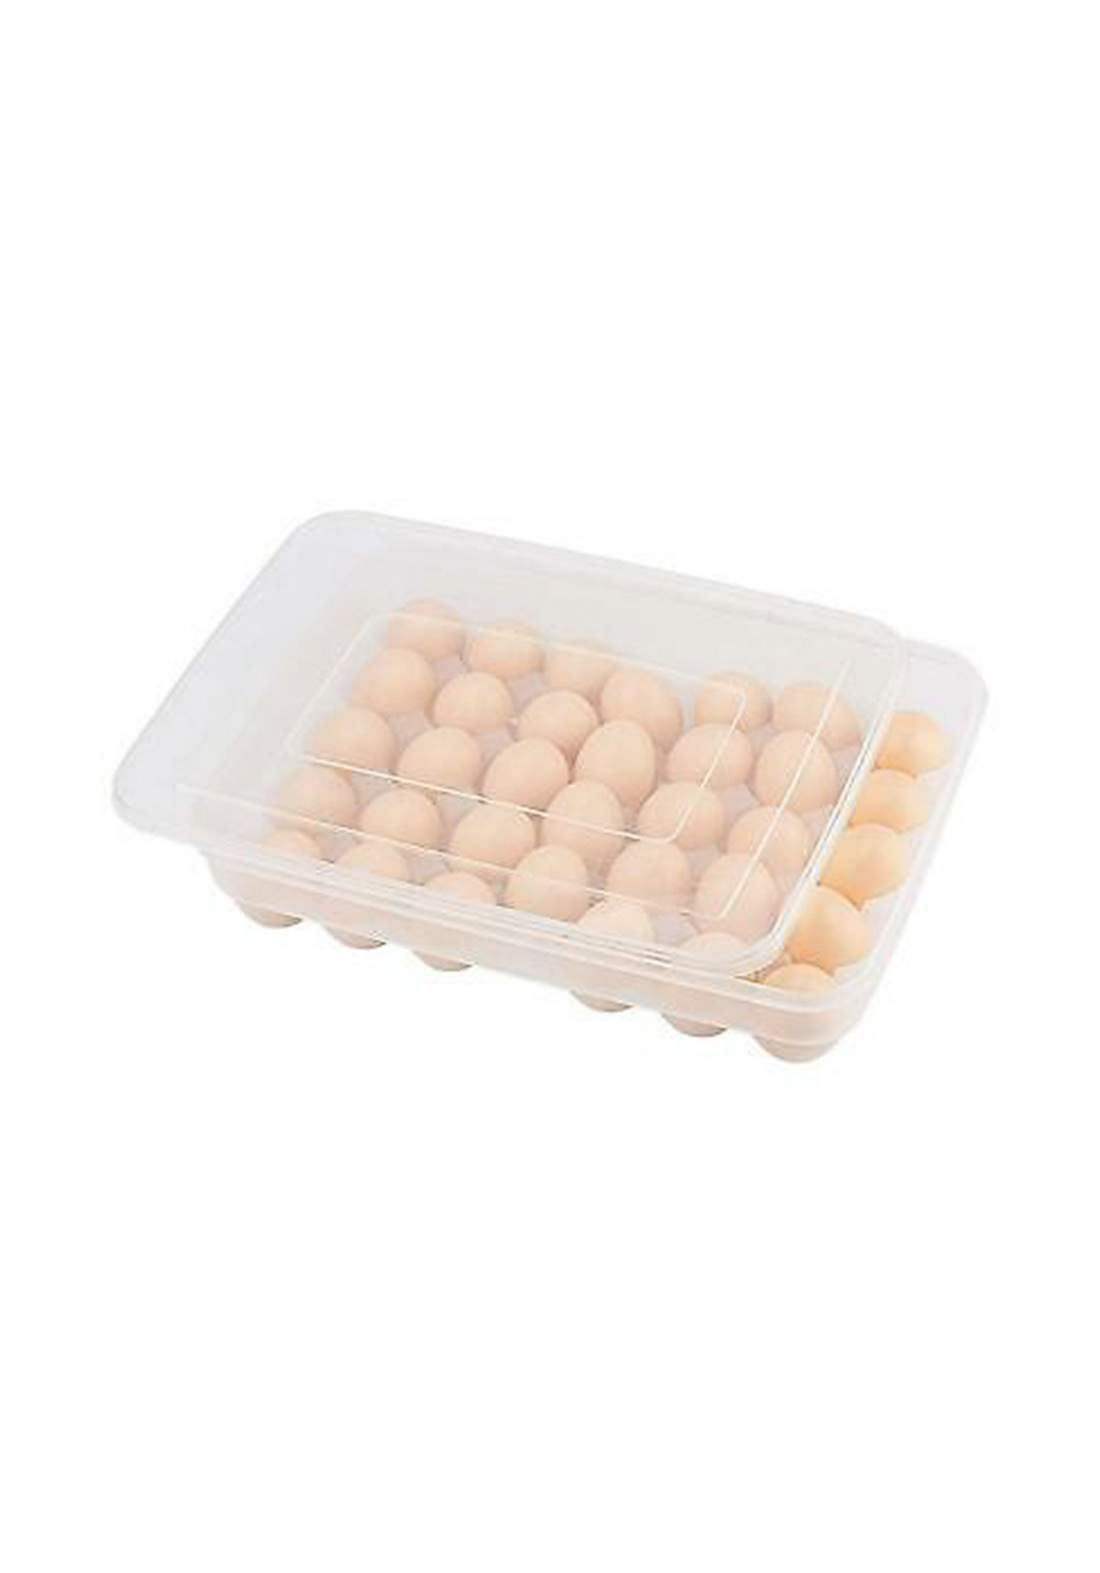 Egg Storage Box For 34 Eggs حافظة بيض